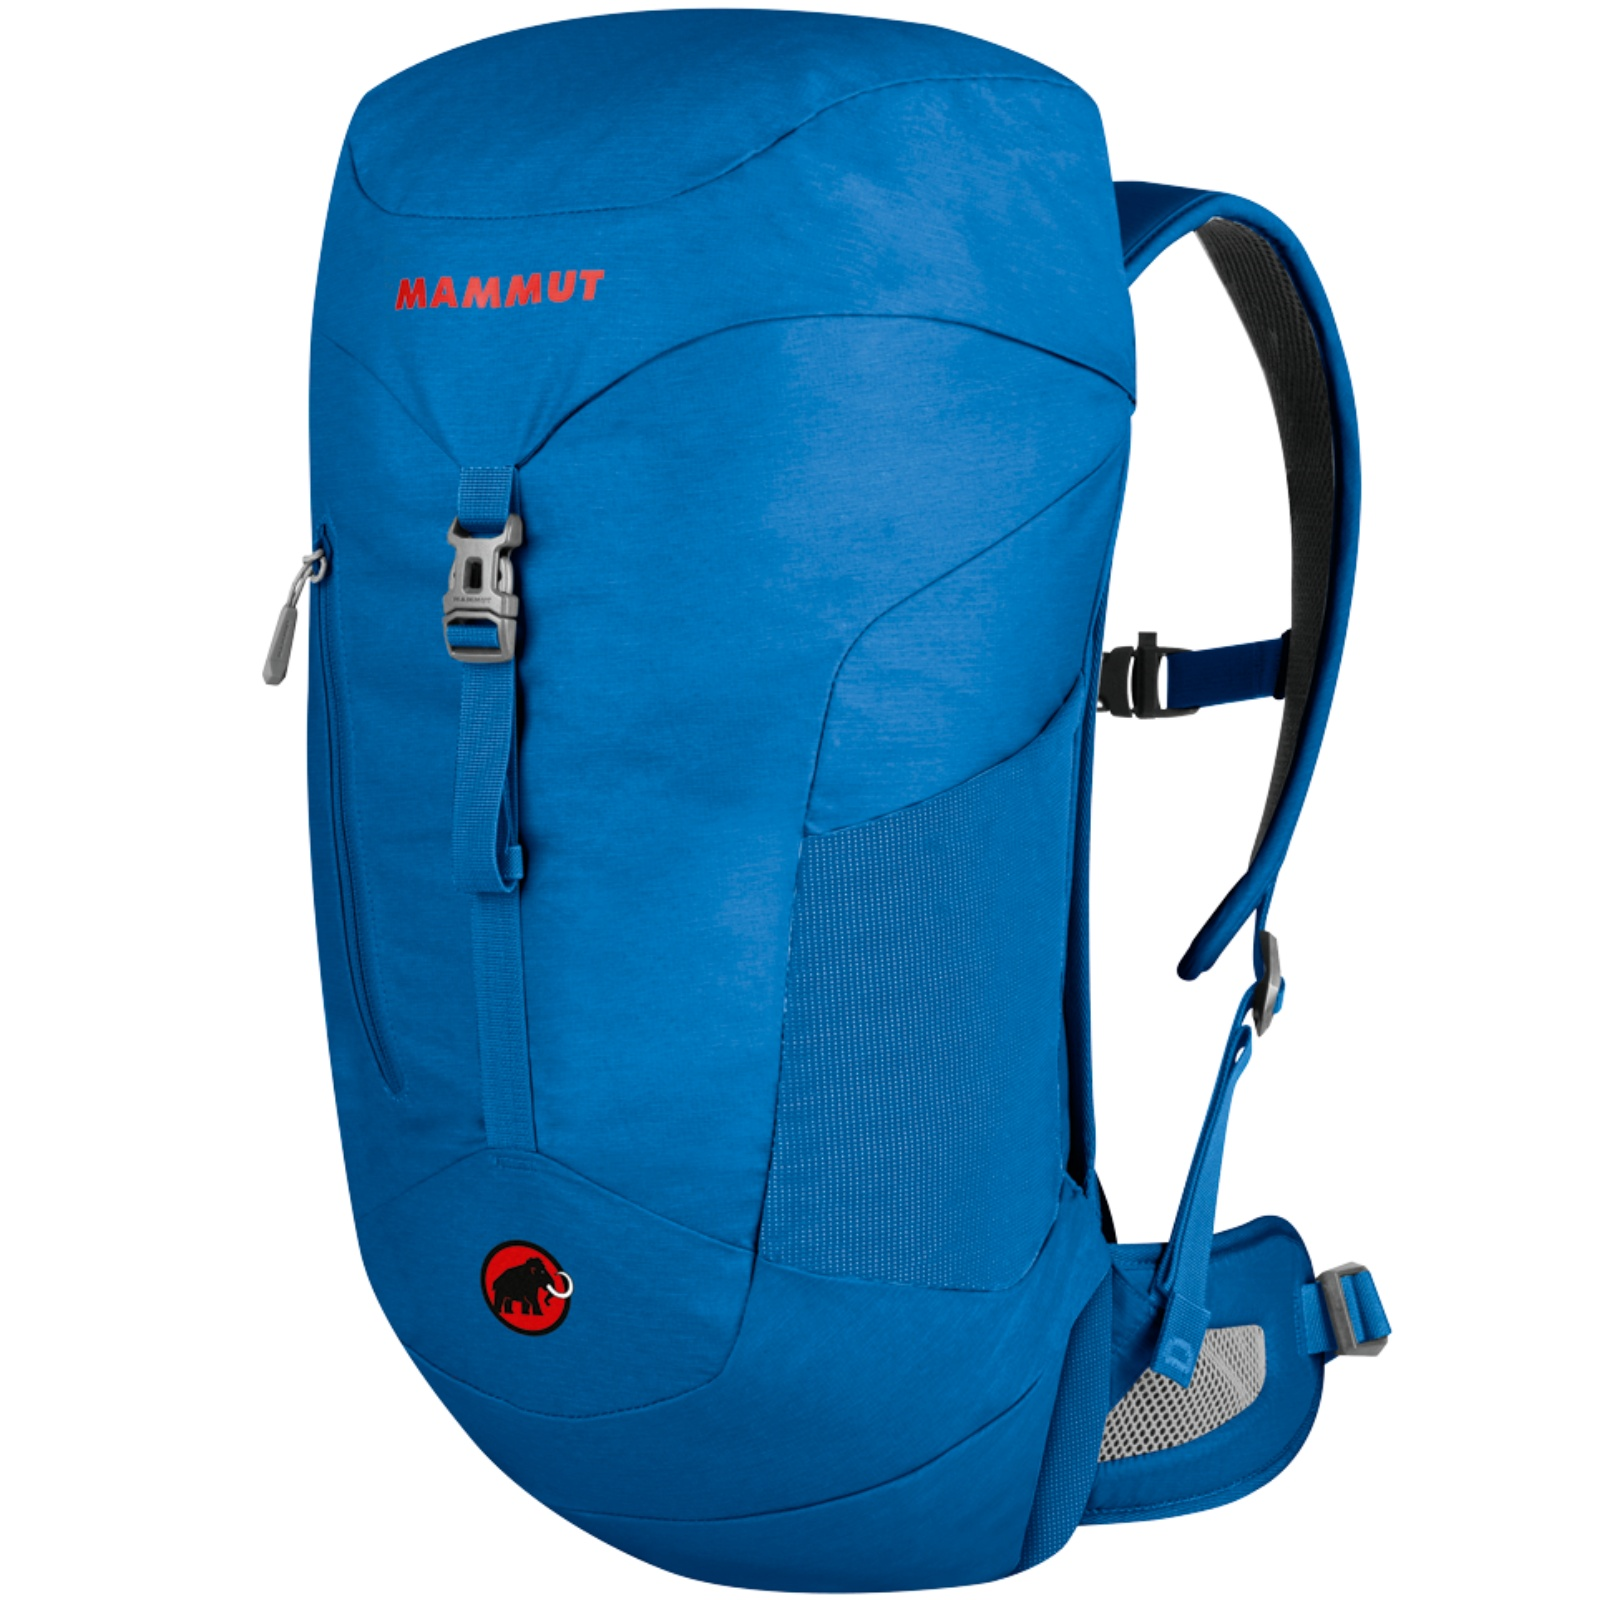 Outdoorový batoh MAMMUT Creon Tour 28 - modrý